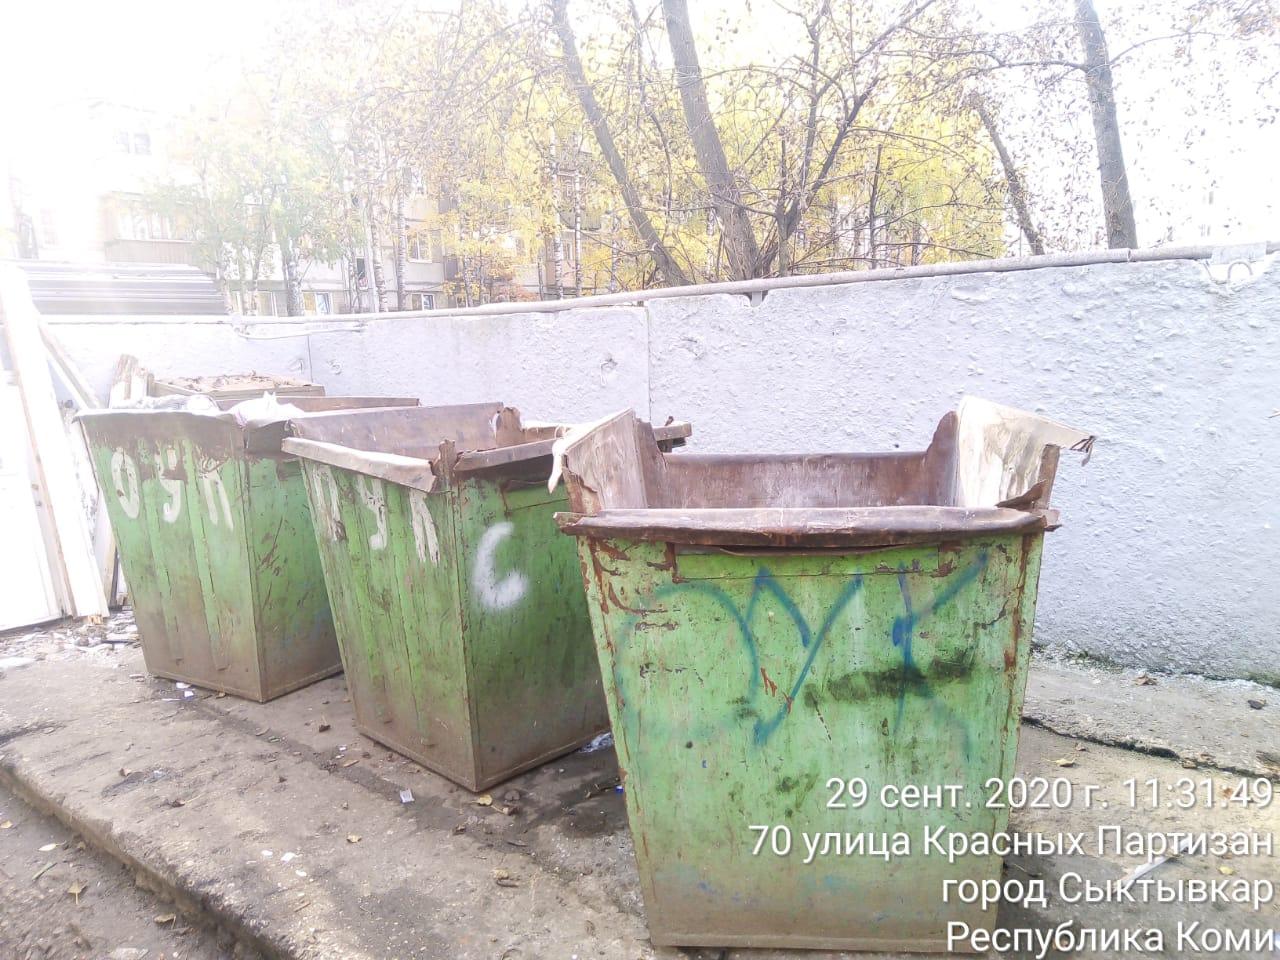 k-partizan-70-priezghaem-2-raza-v-den.-neobhodimo-postavit-bunker-remont-konteinerov.jpg